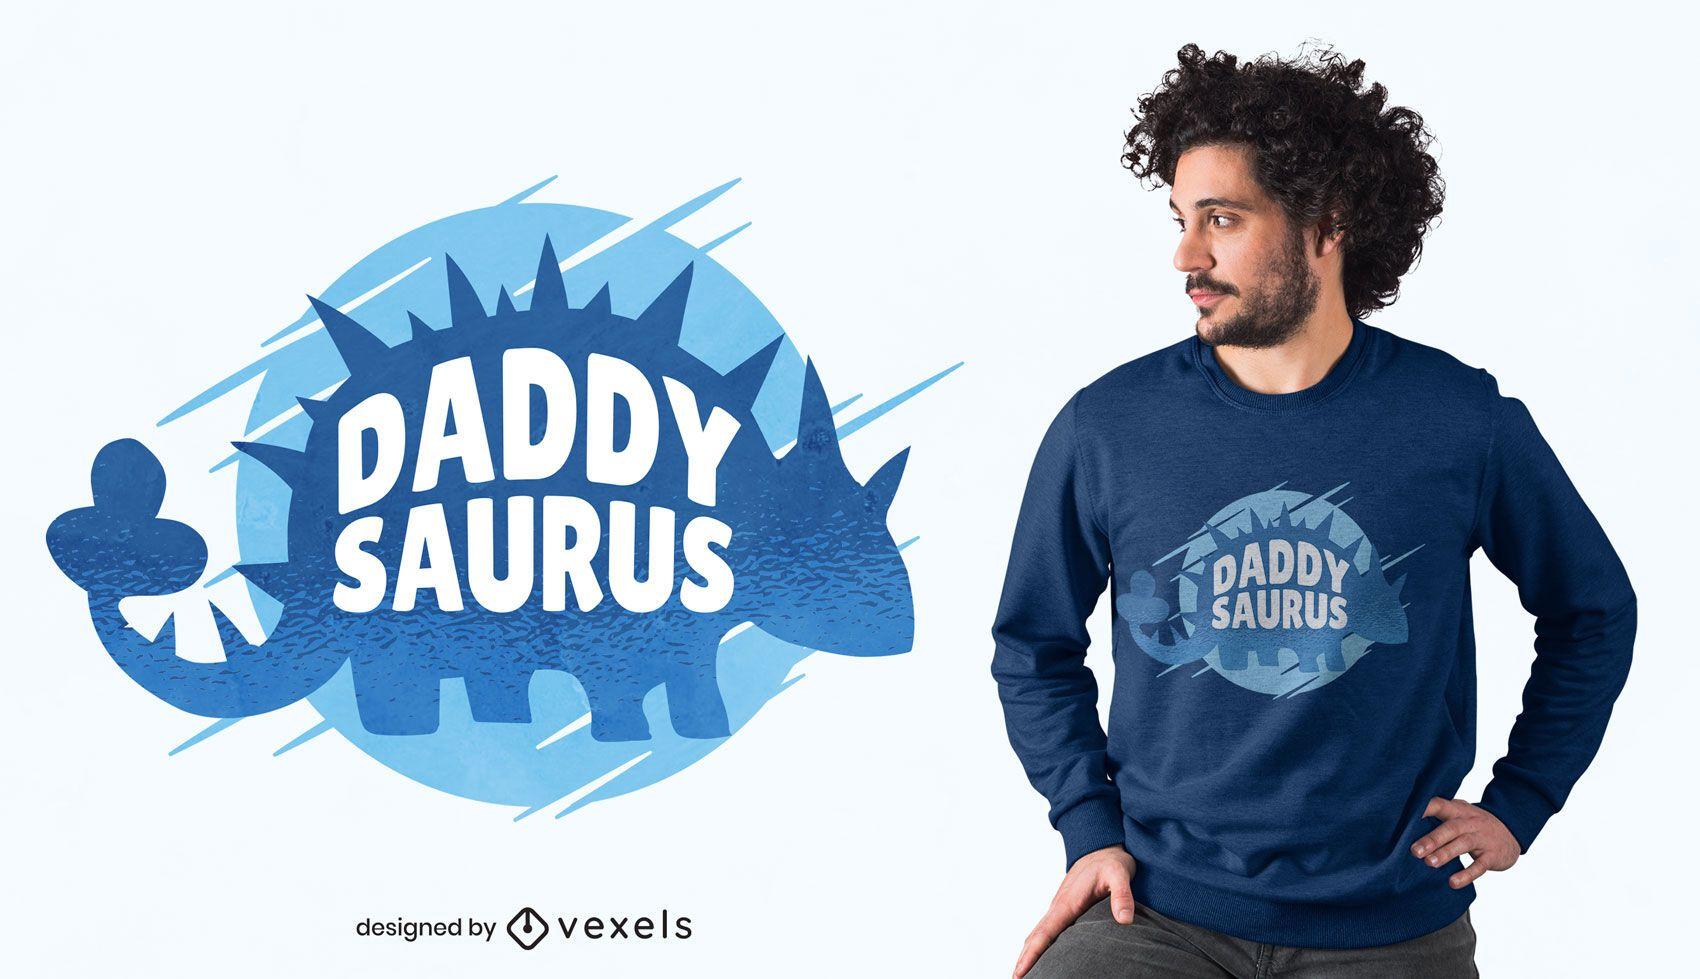 Daddy saurus t-shirt design